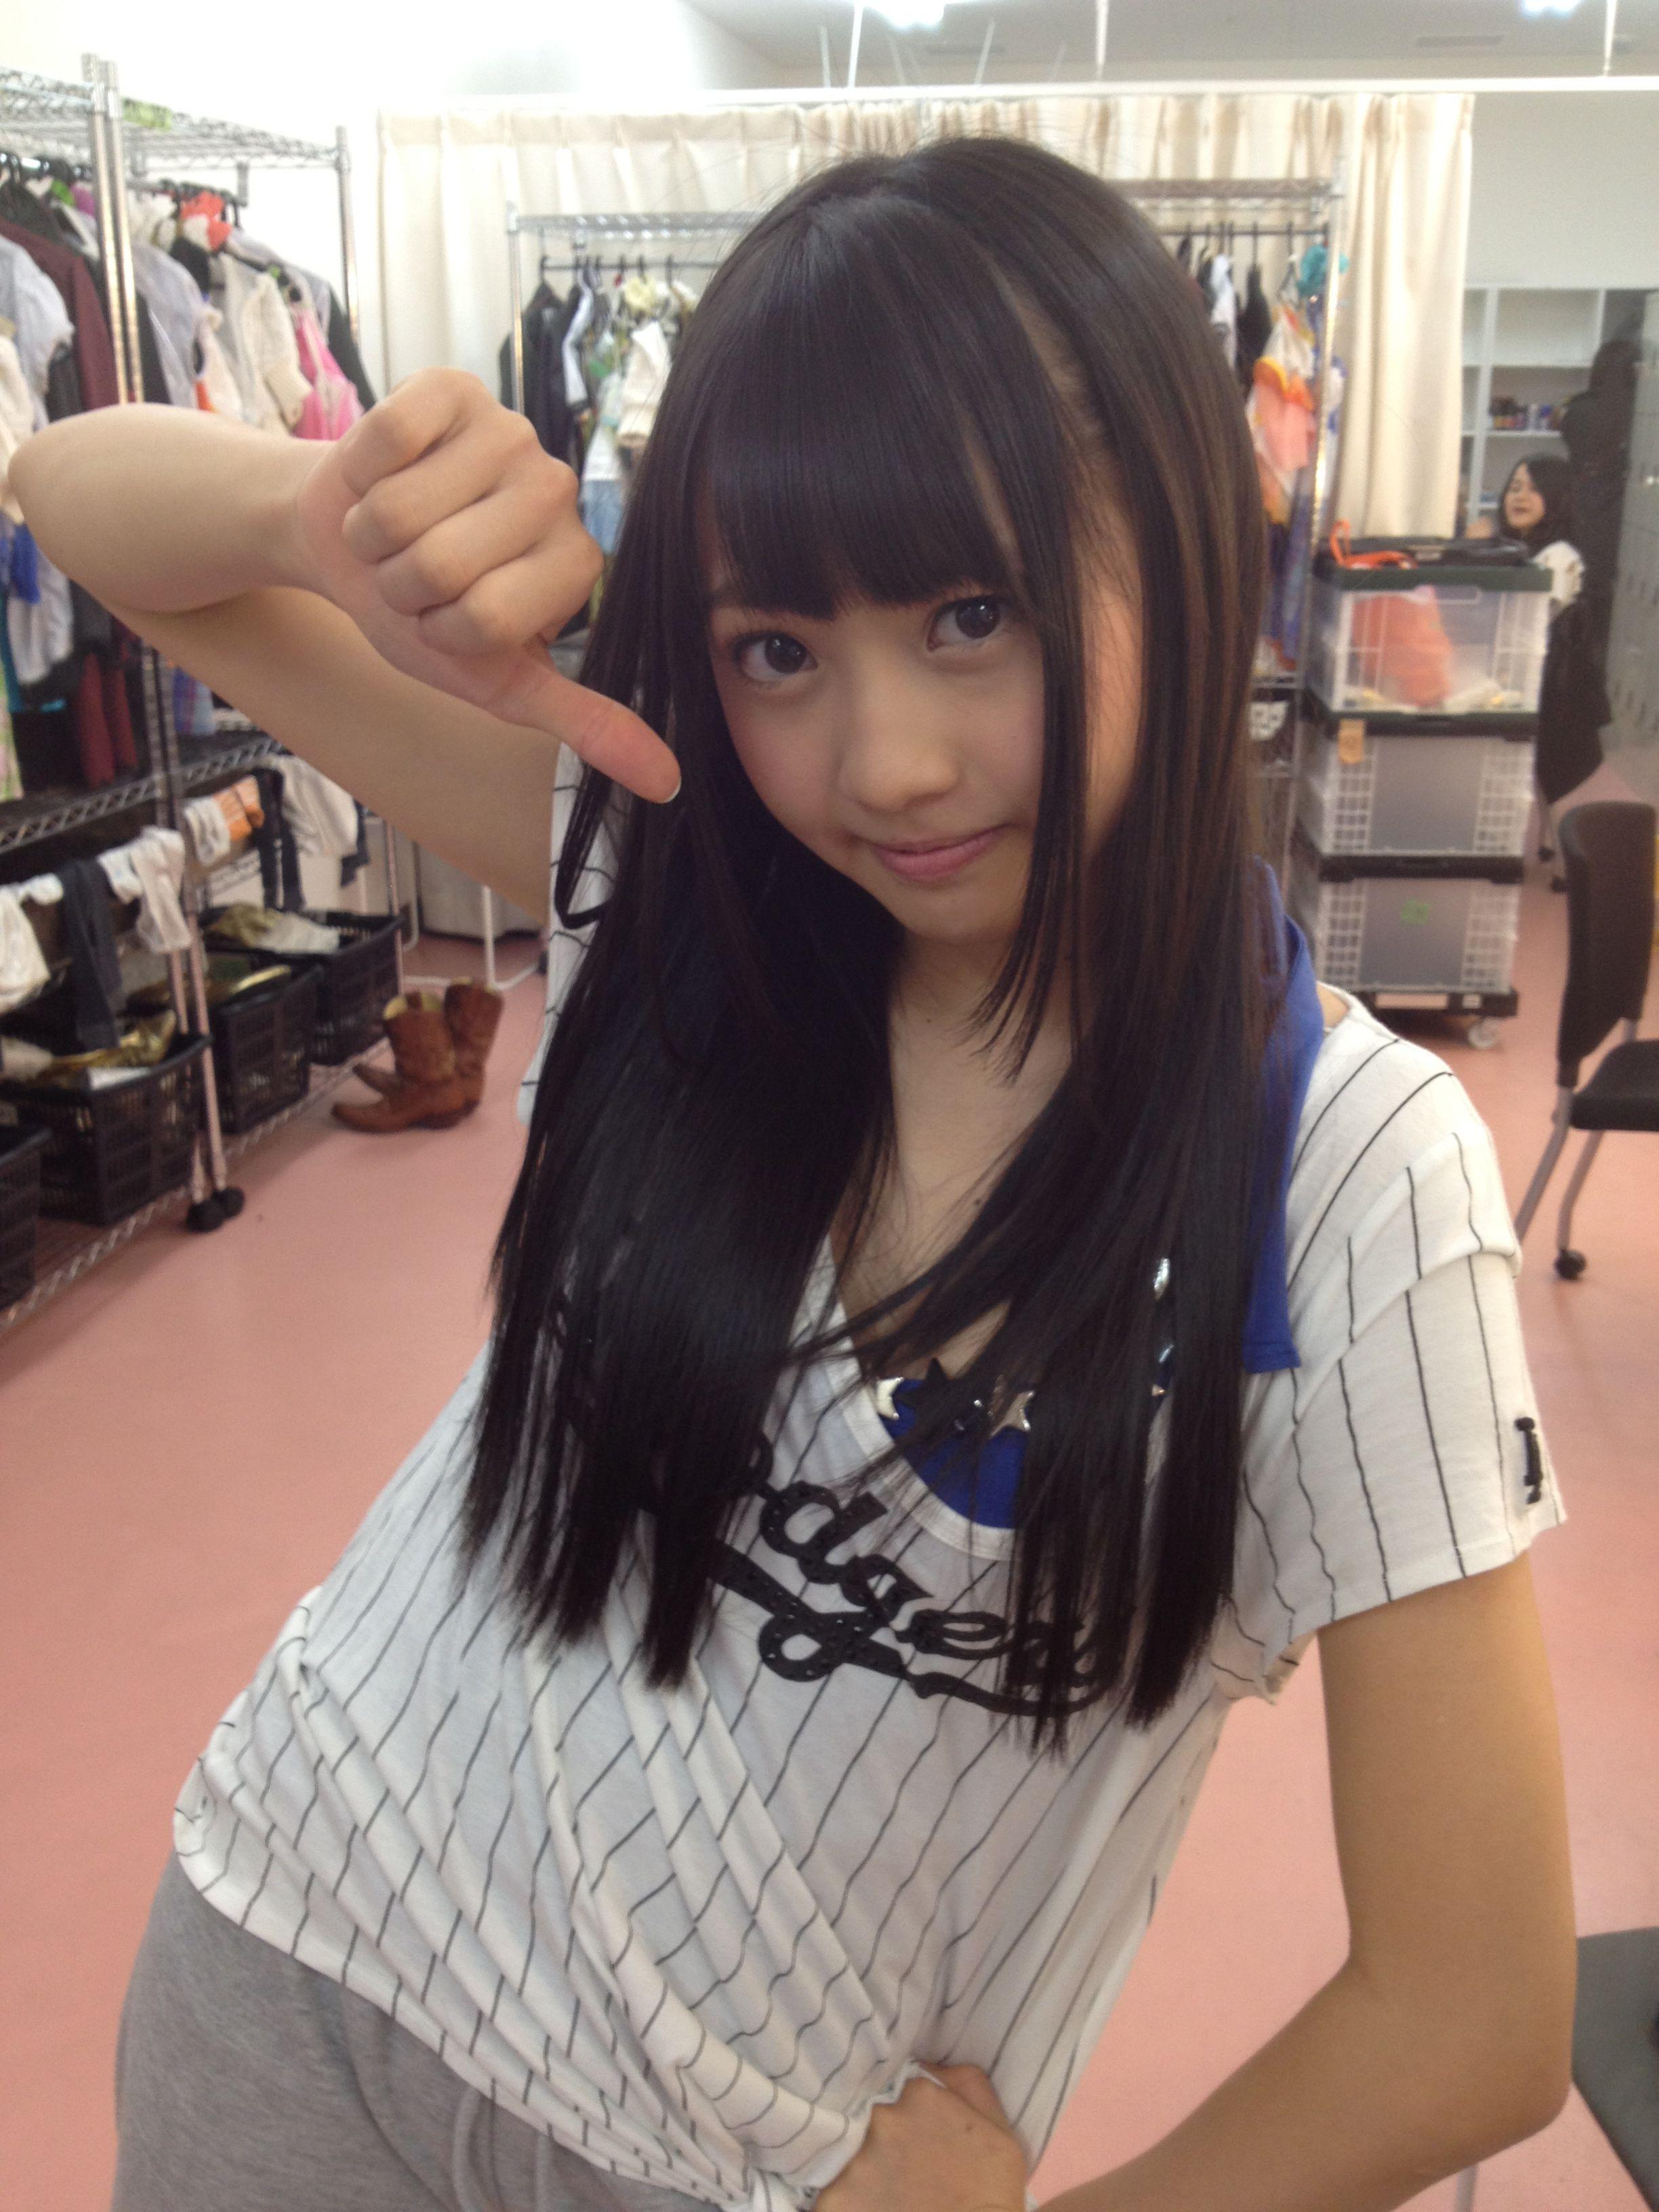 NAVER まとめ元SKE48 AKB48 [木崎ゆりあ] エロ可愛い水着 画像・動画集